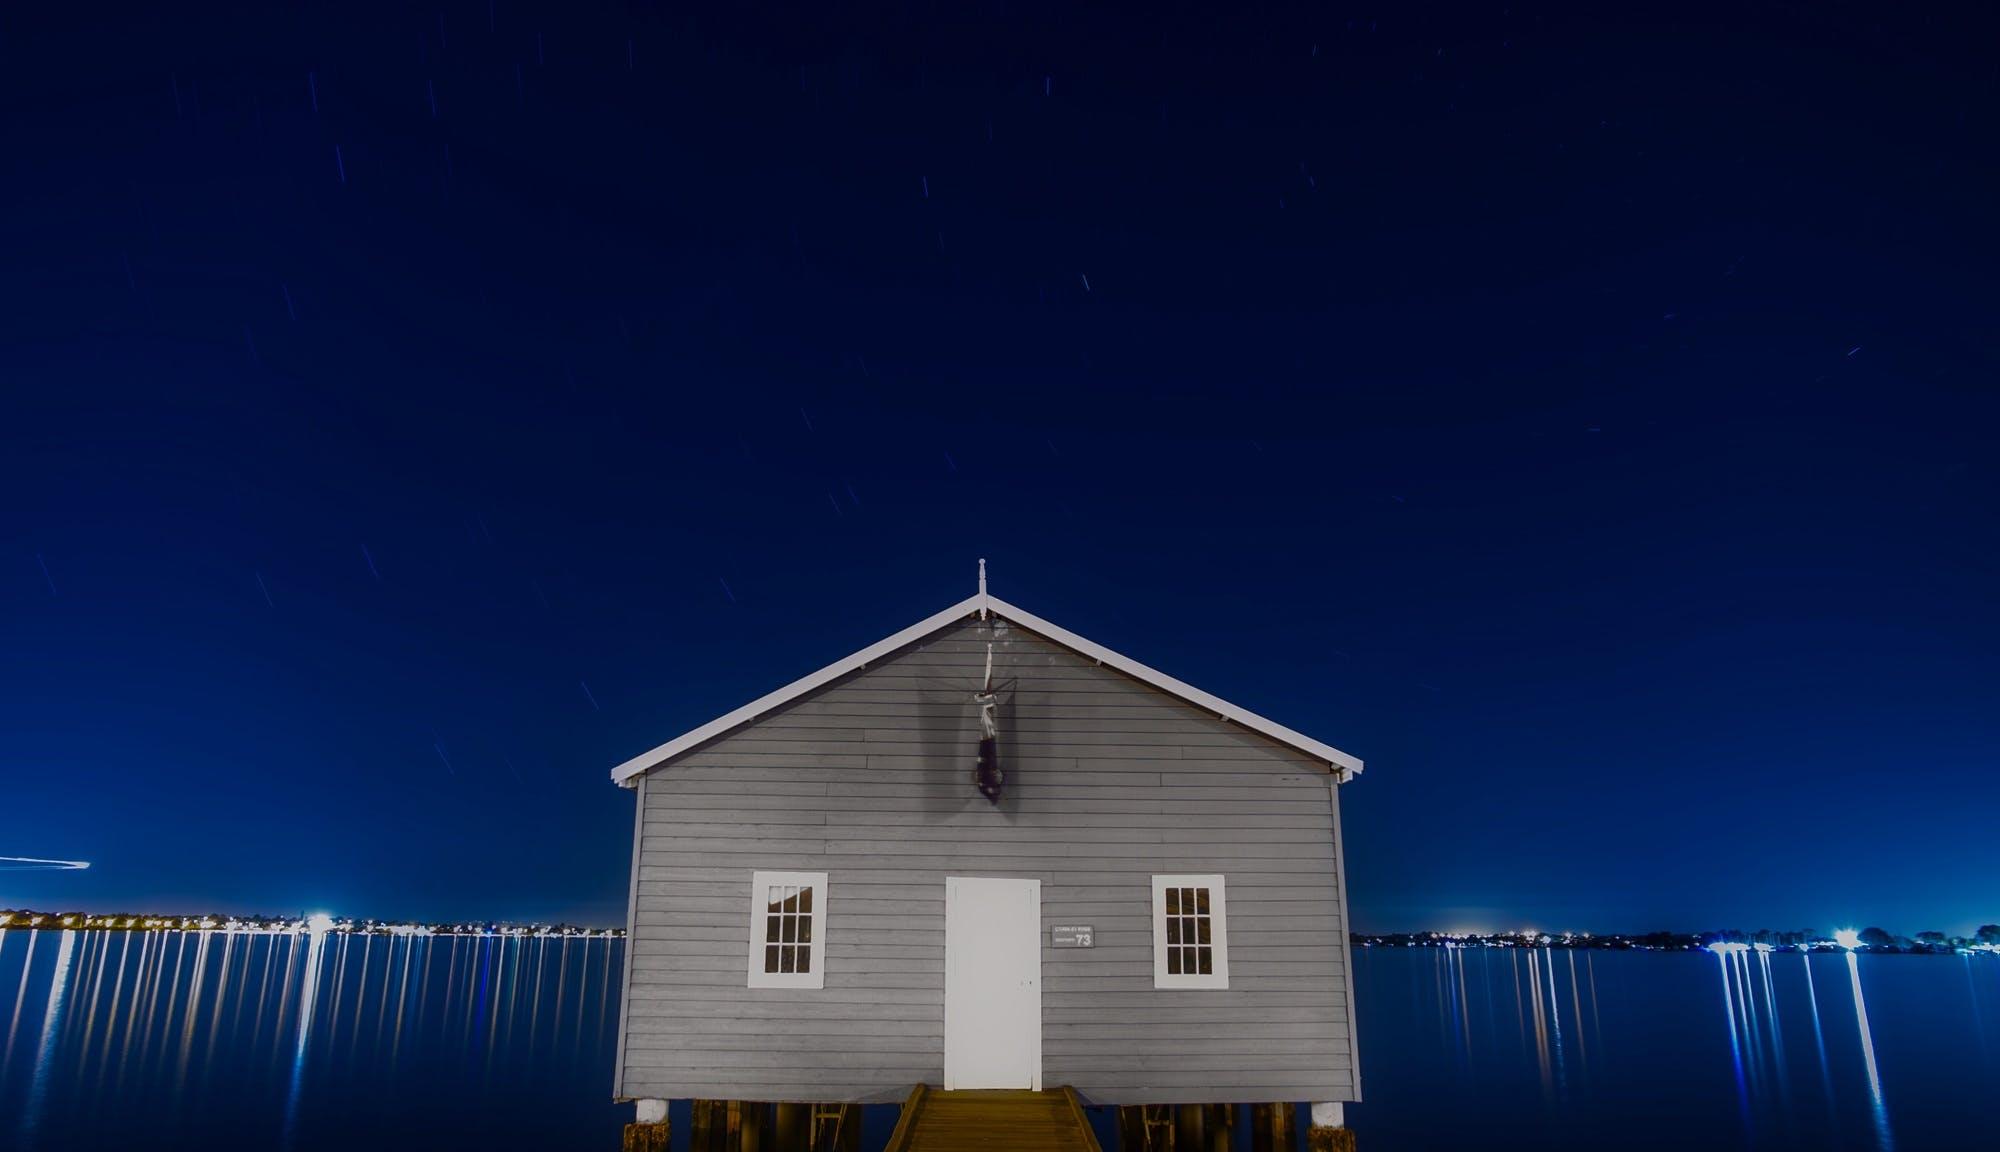 Gratis stockfoto met architectuur, avond, gebouw, h2o